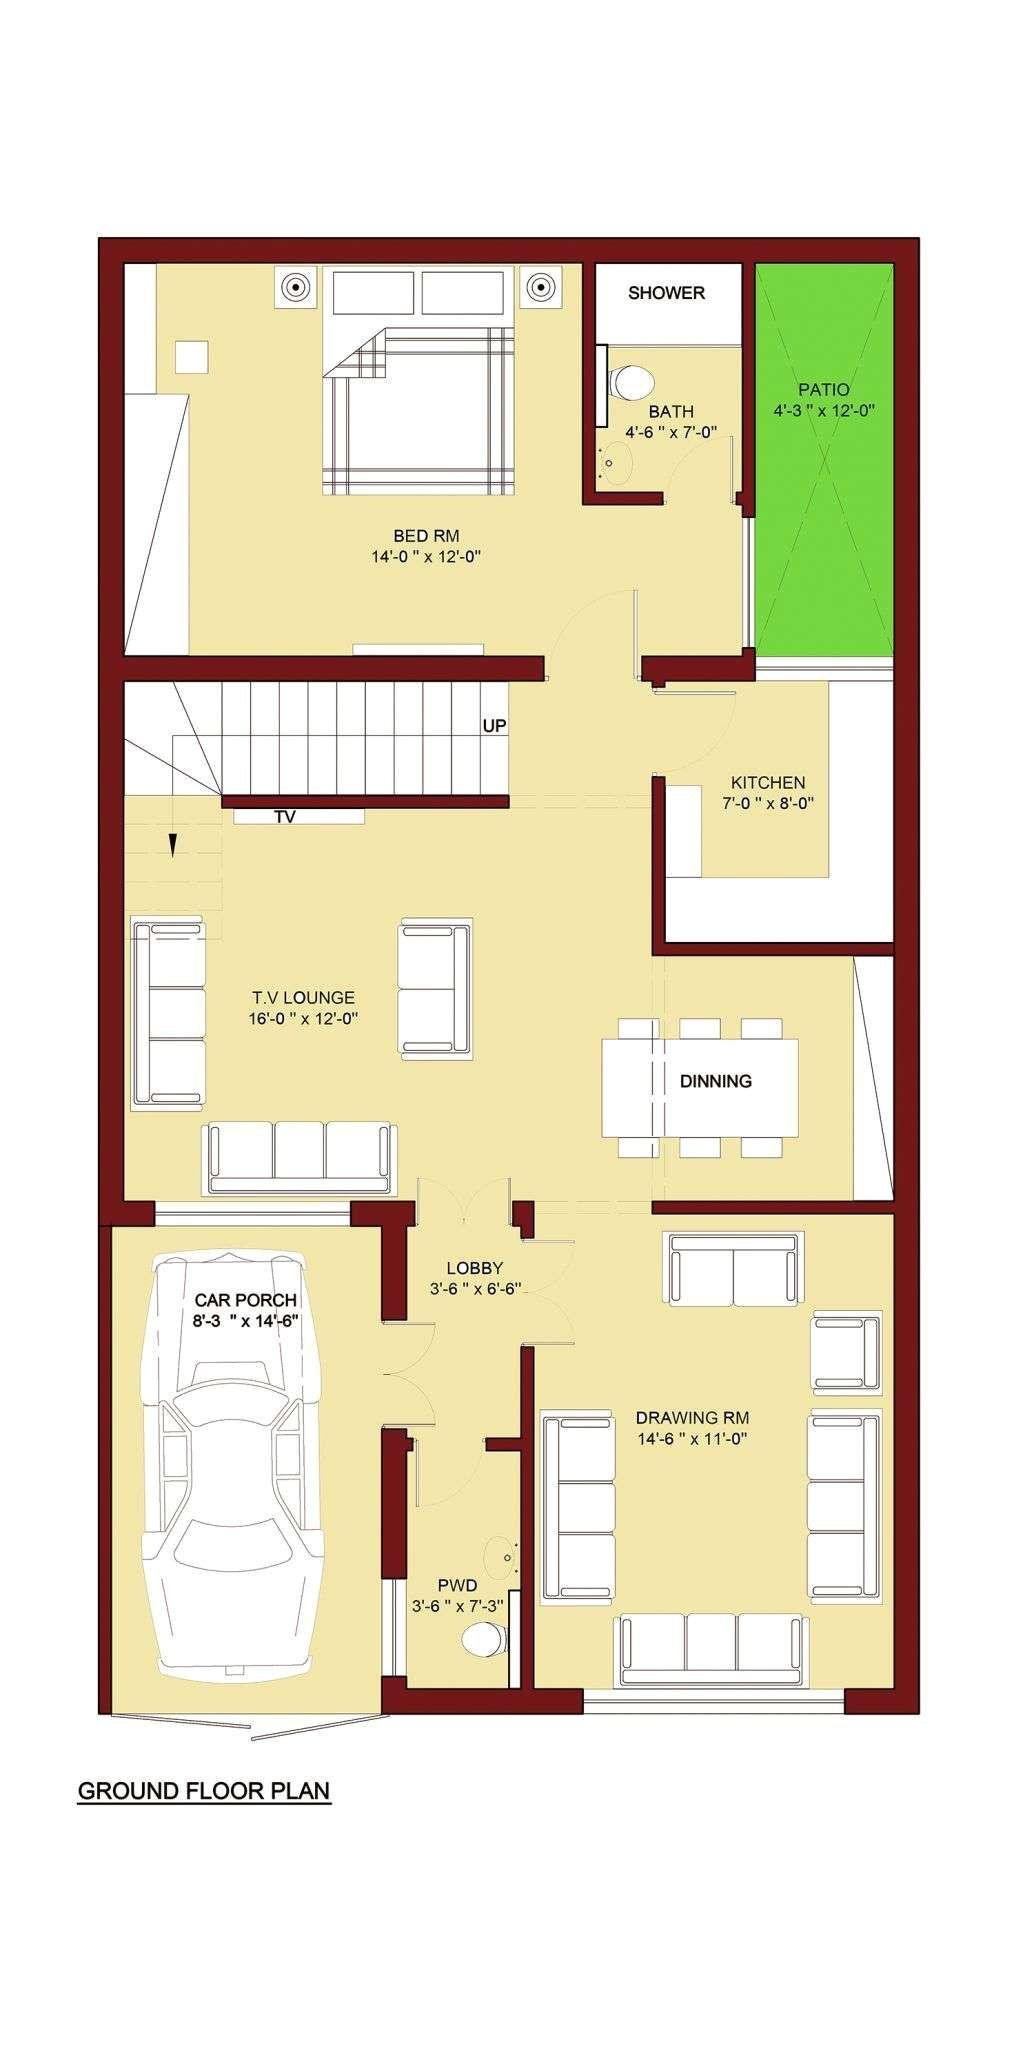 Home Floor Plans Online House Plan Online New 20 Unique New 2 Story House Plans